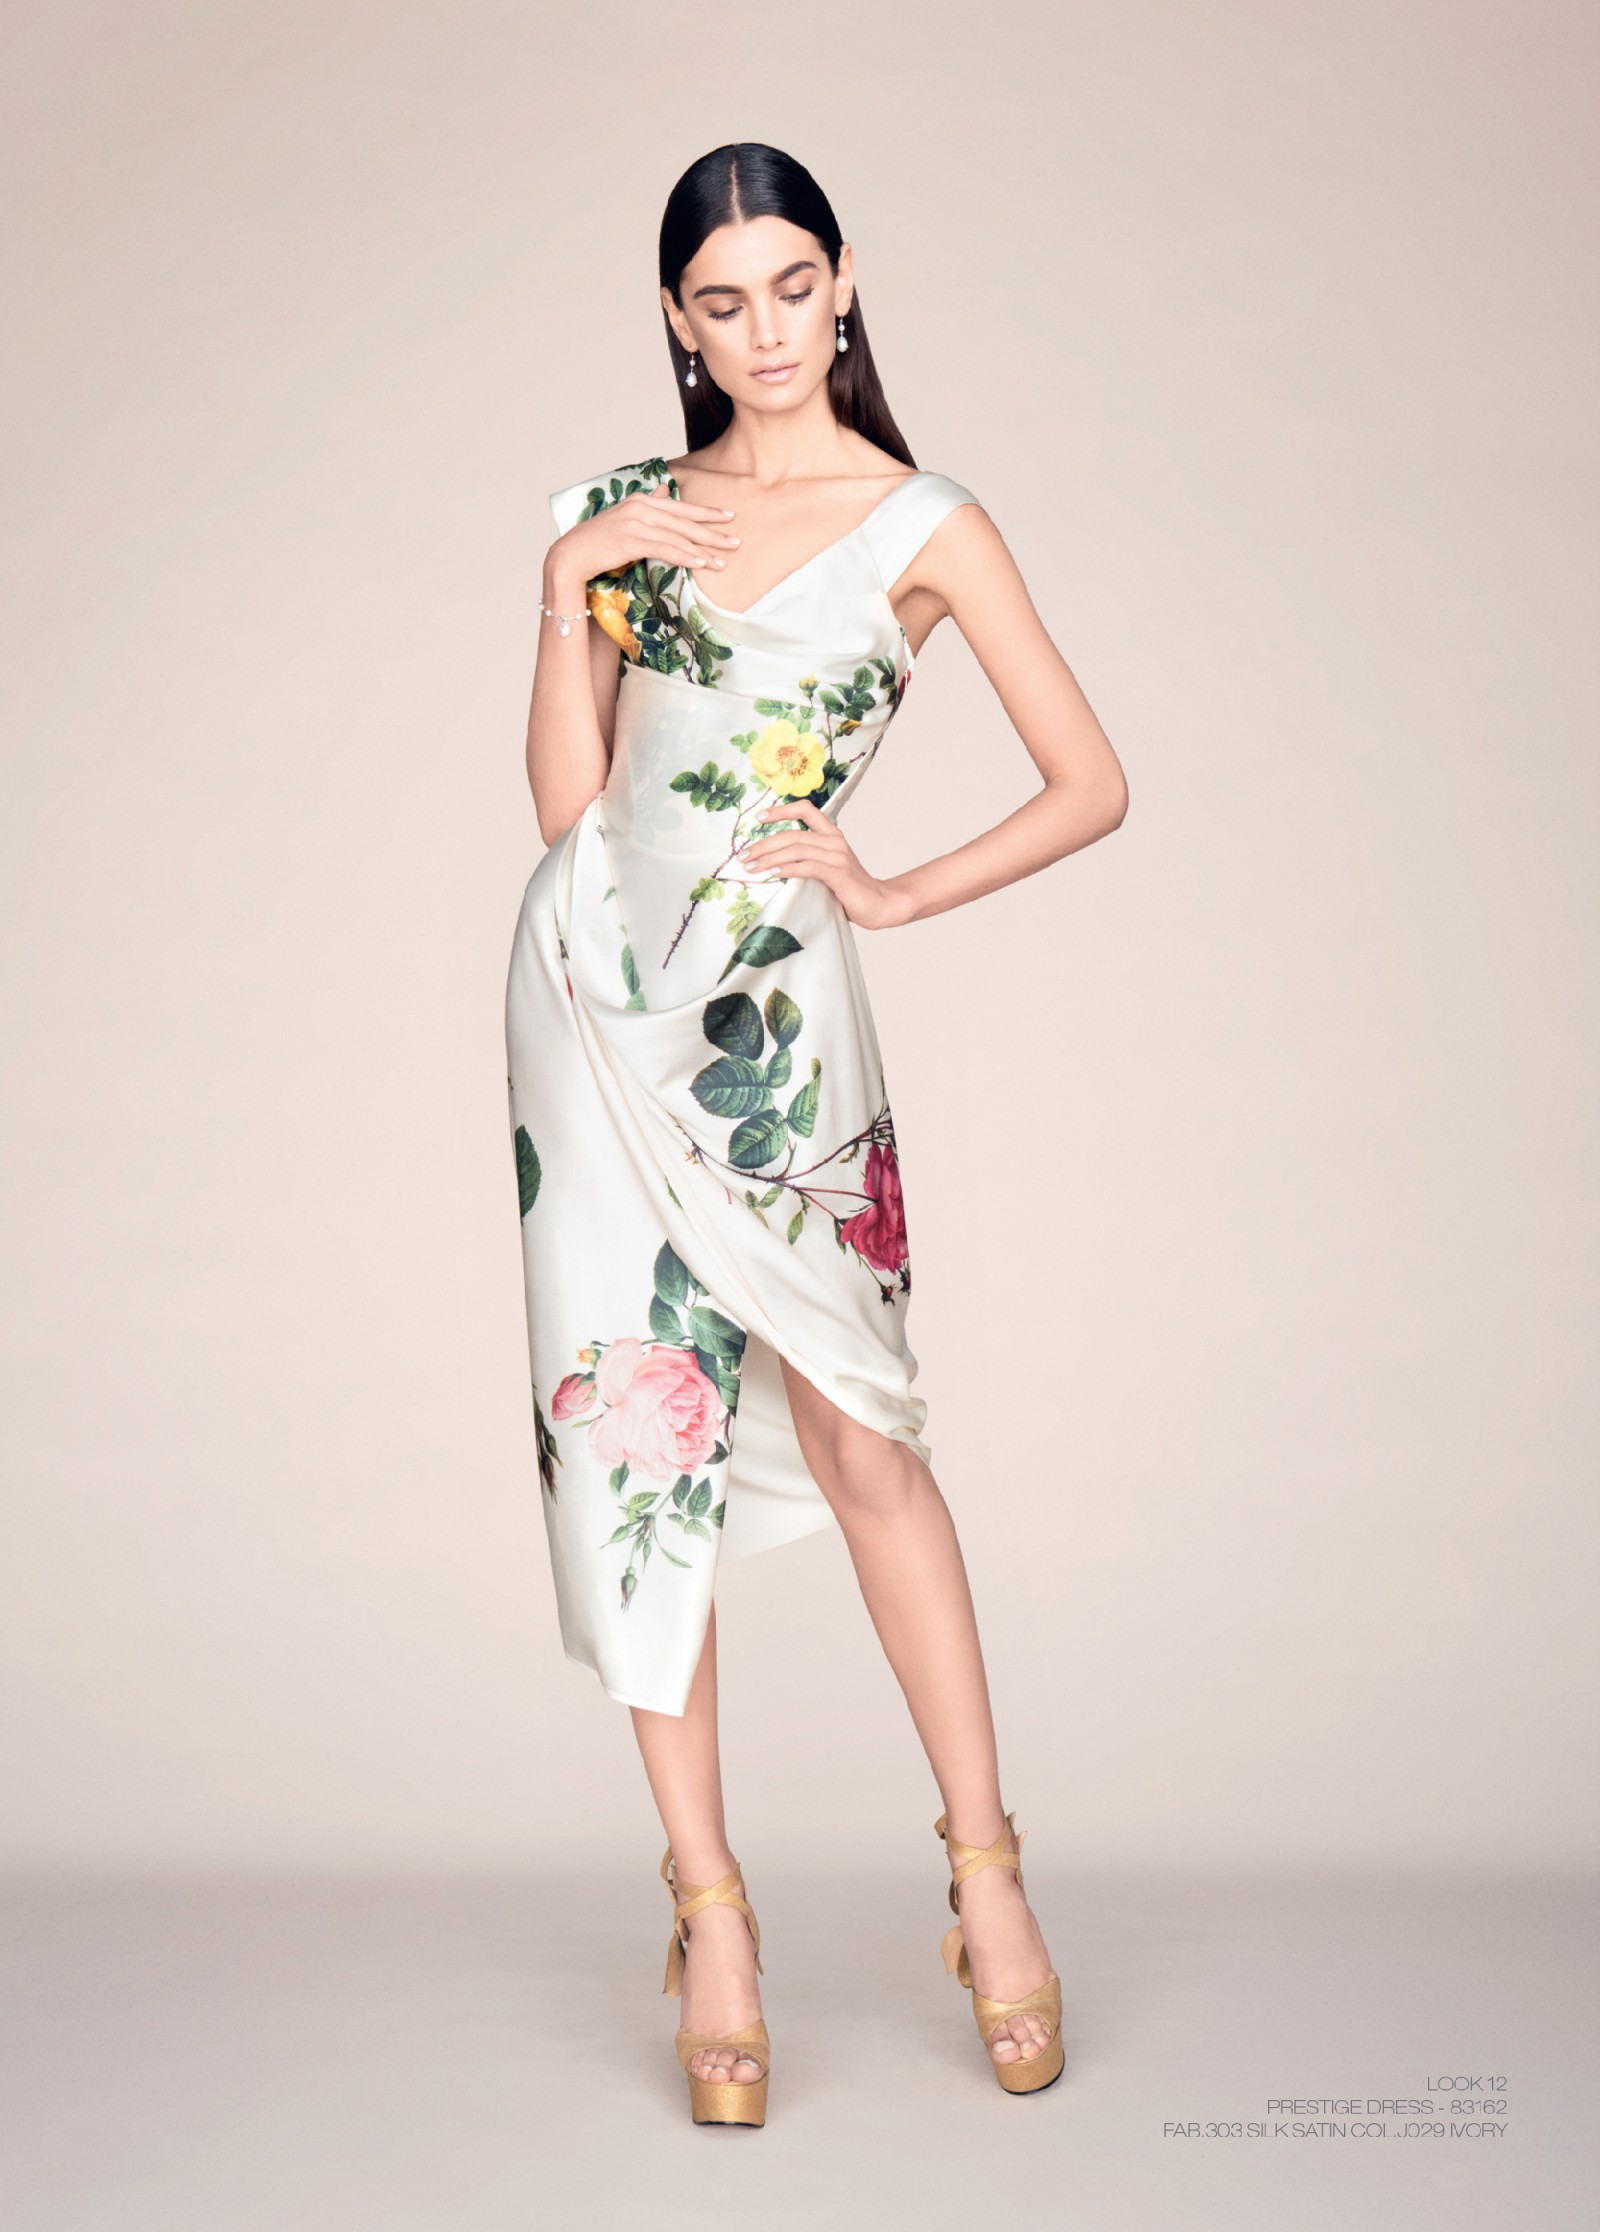 Viviene Westwood Wedding Dresses.Vivienne Westwood Prestige Dress Wedding Dress On Sale 59 Off